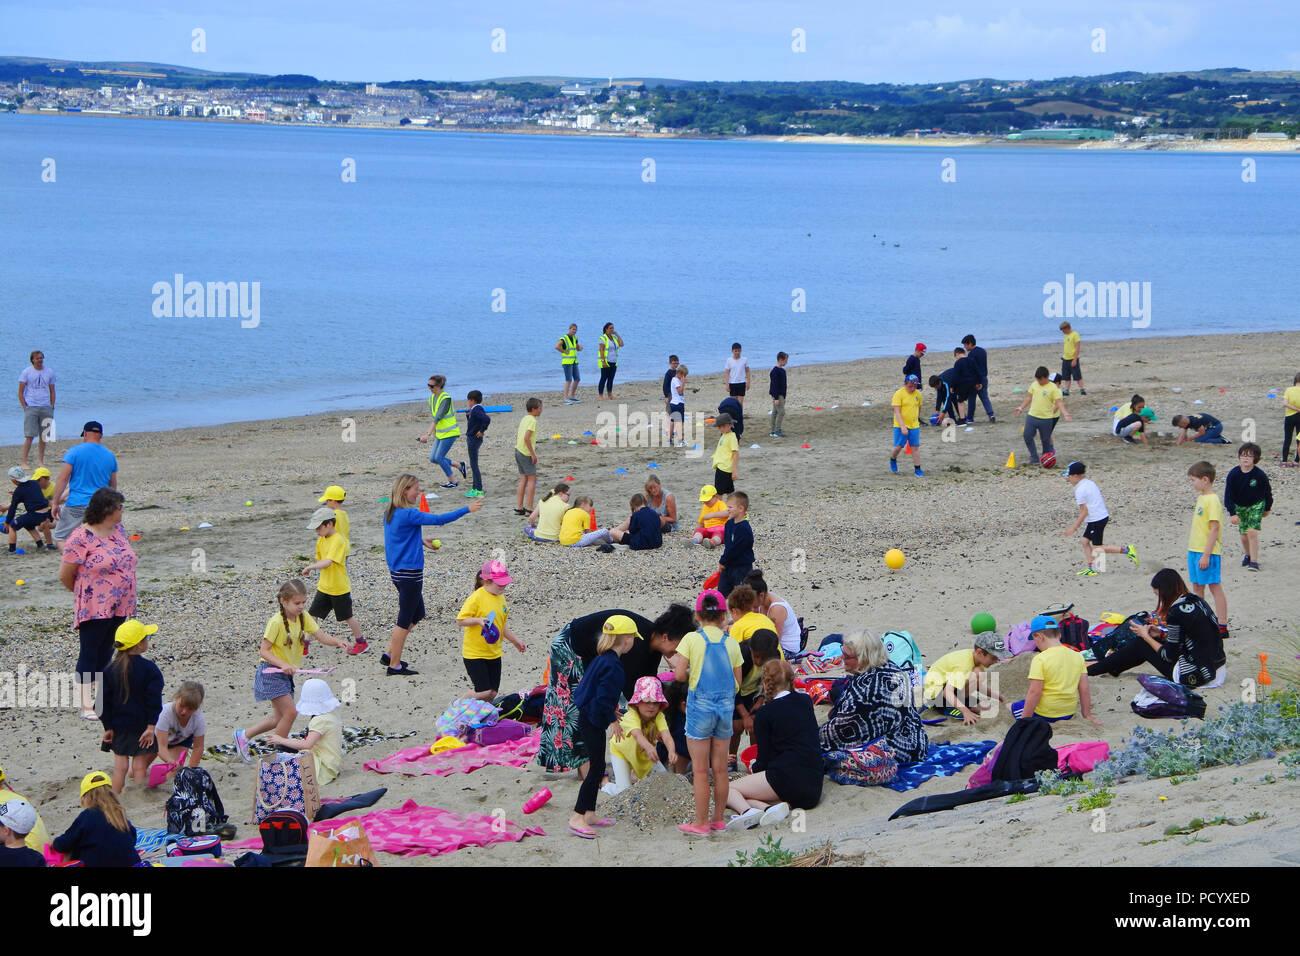 An educational group on the beach at Marazion, Cornwall, UK - John Gollop - Stock Image